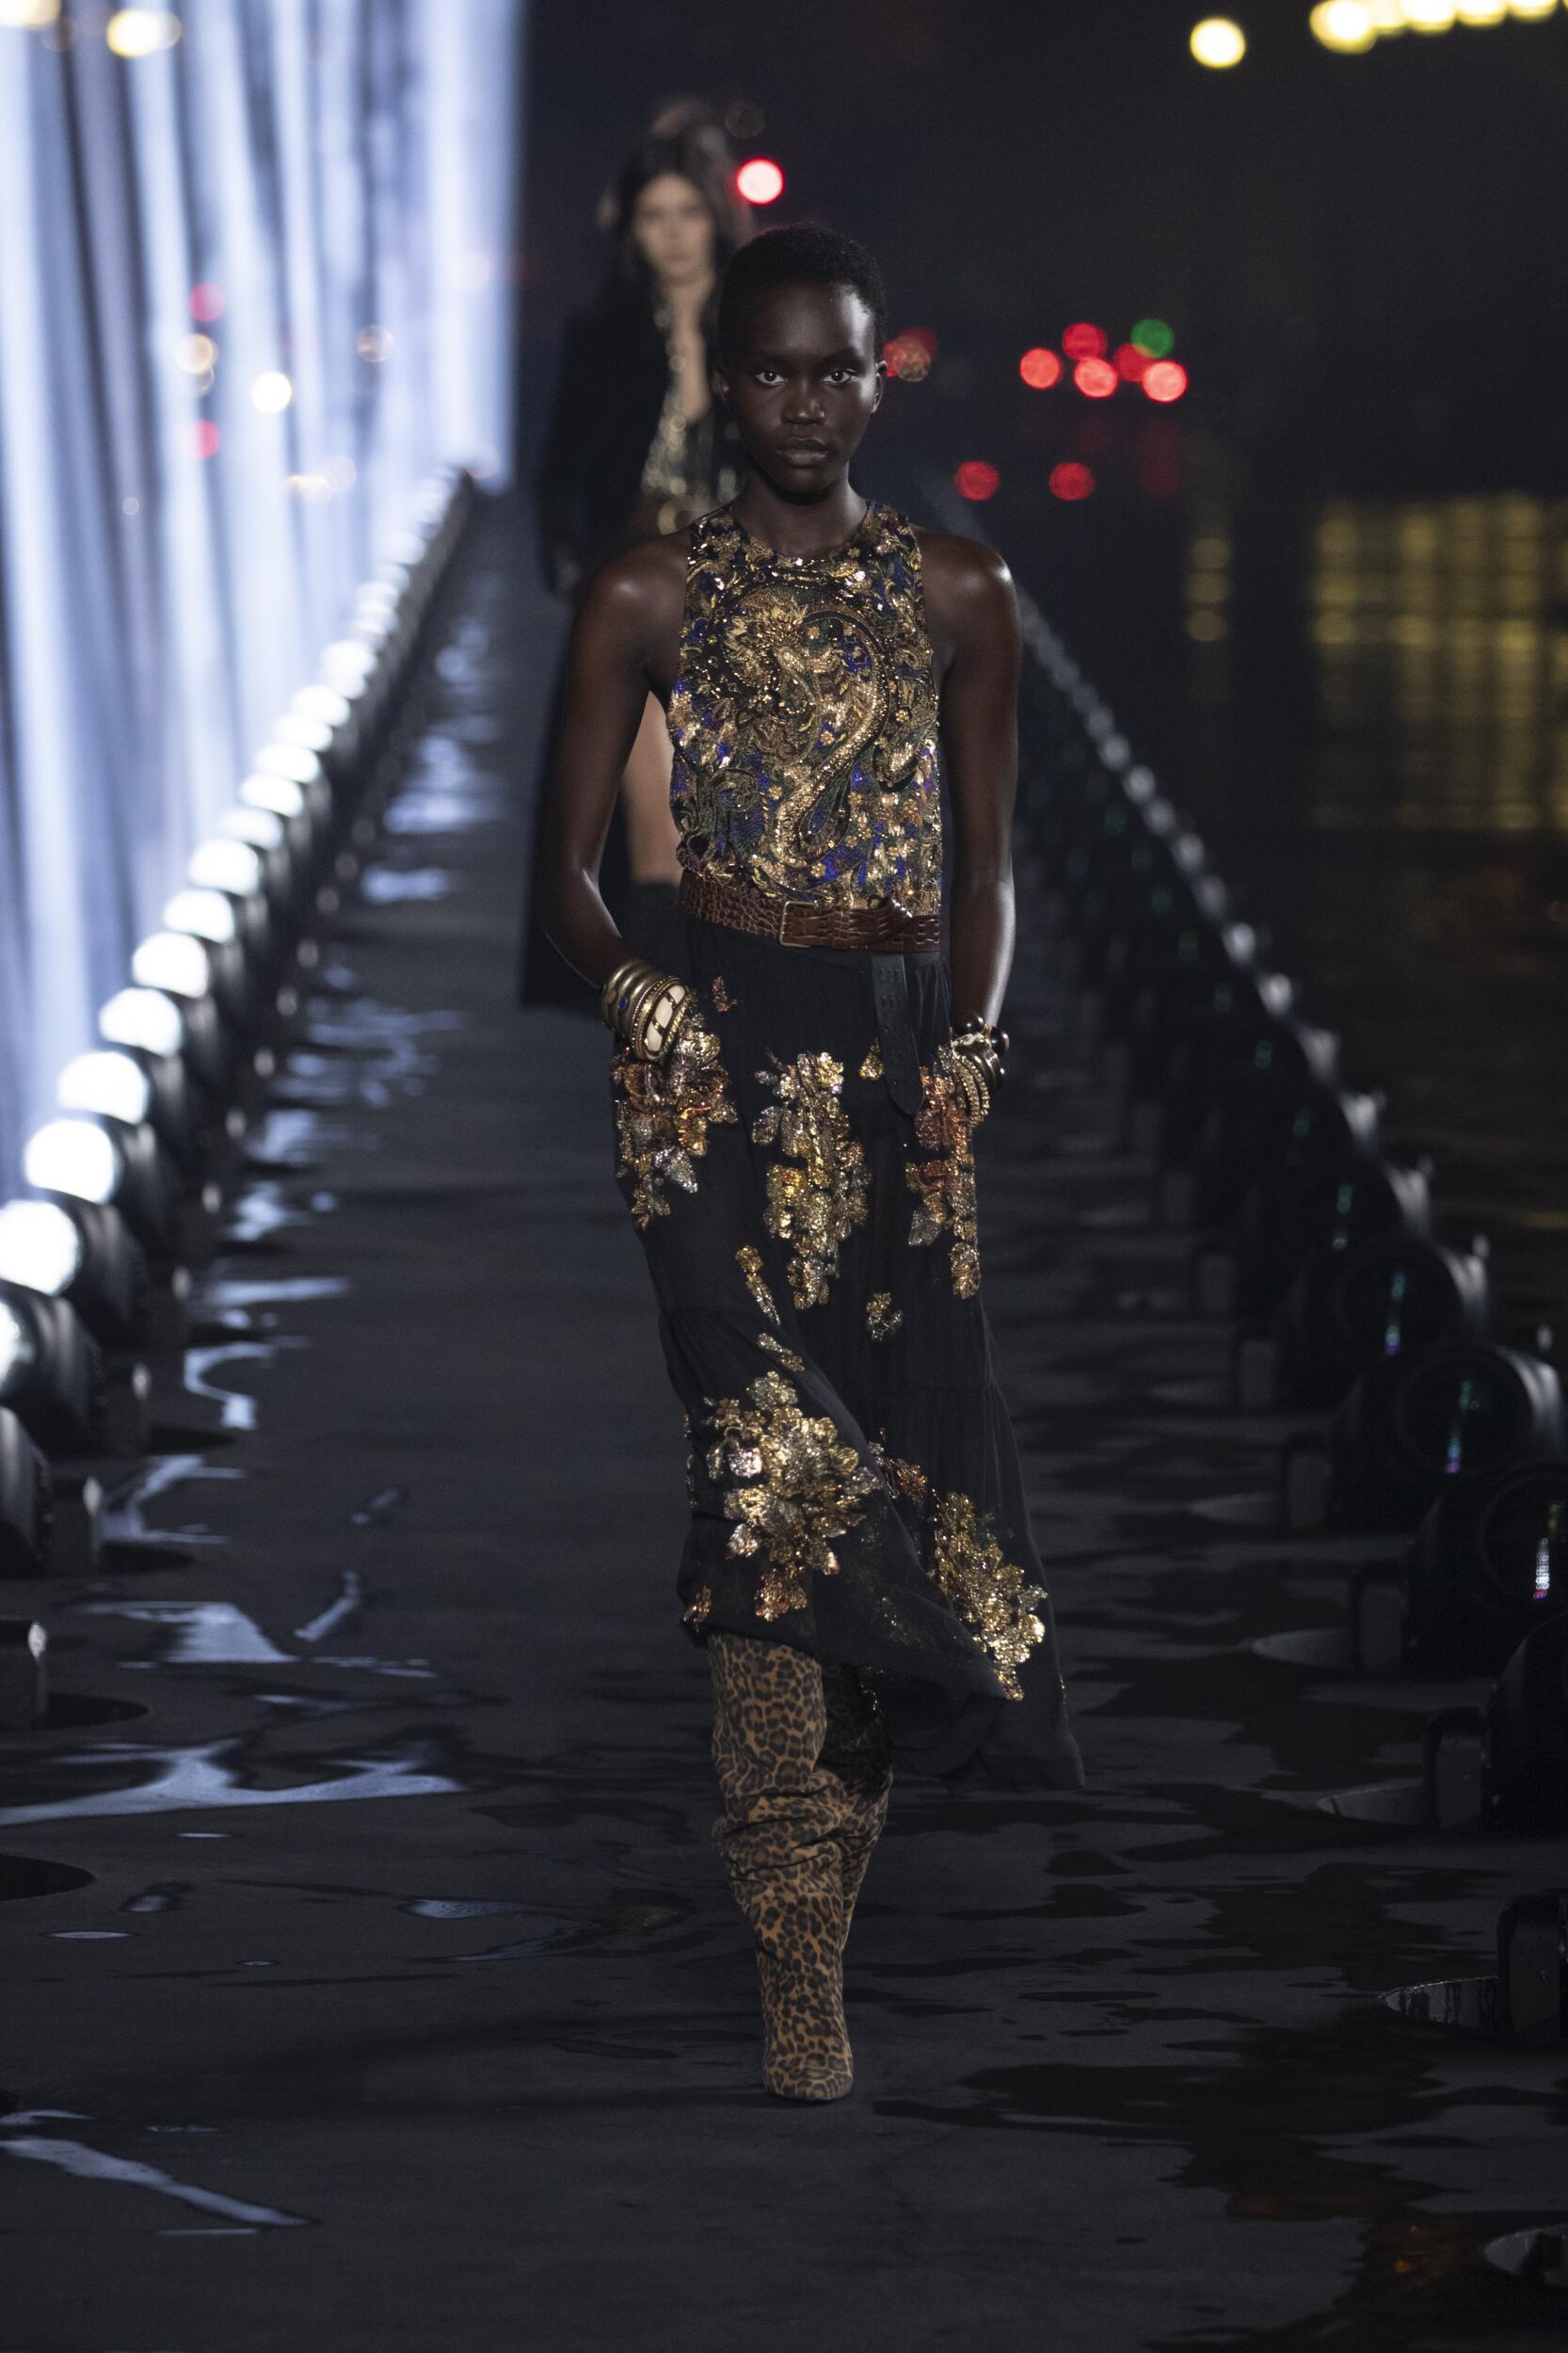 Fashion Model Woman Saint Laurent Catwalk